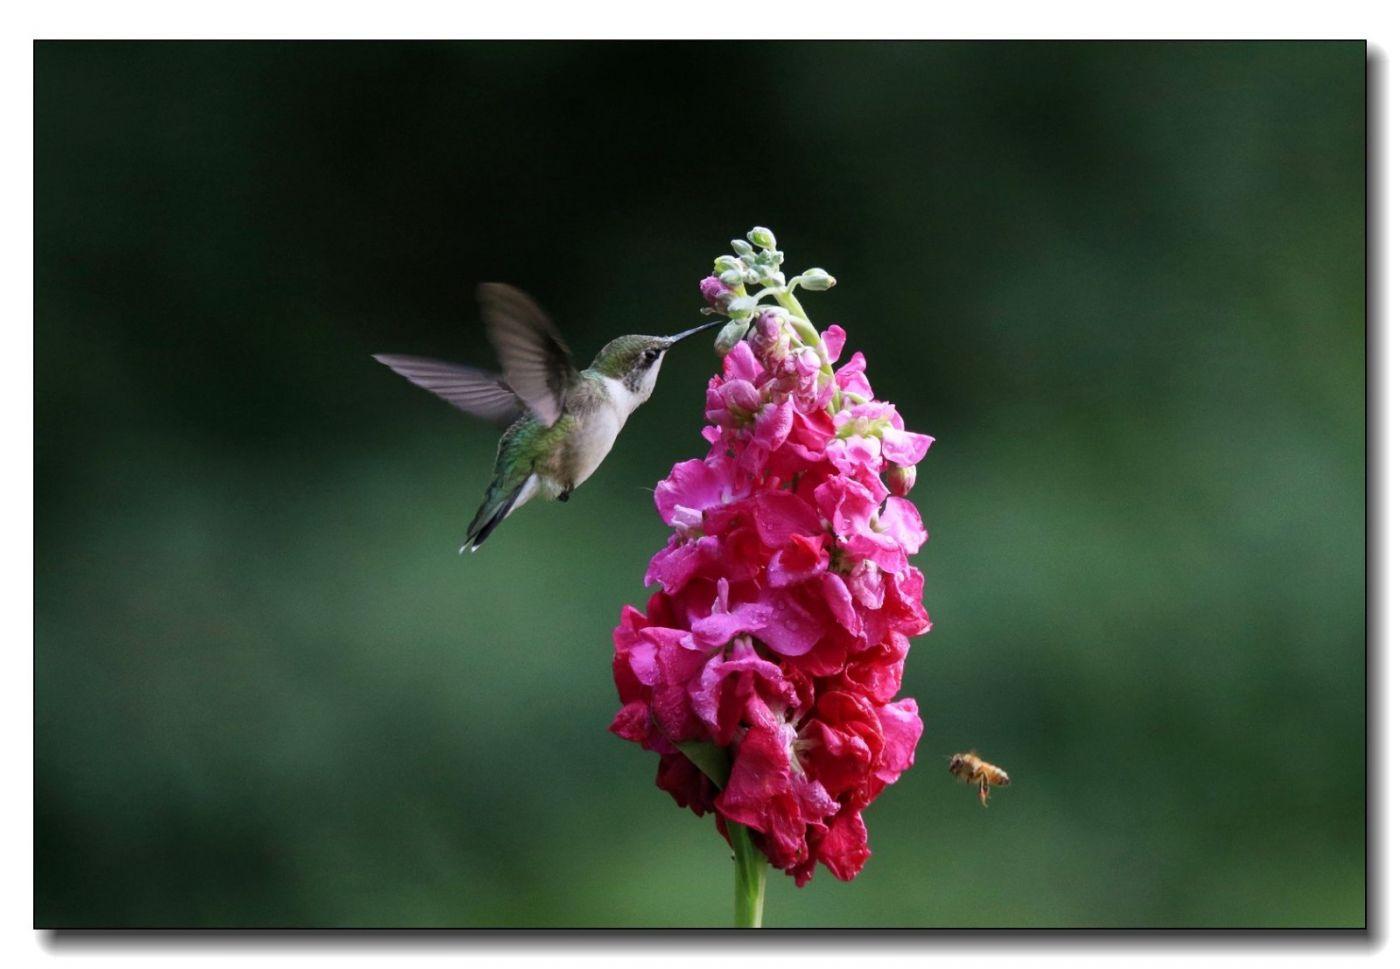 蜂鸟组图(一)_图1-3